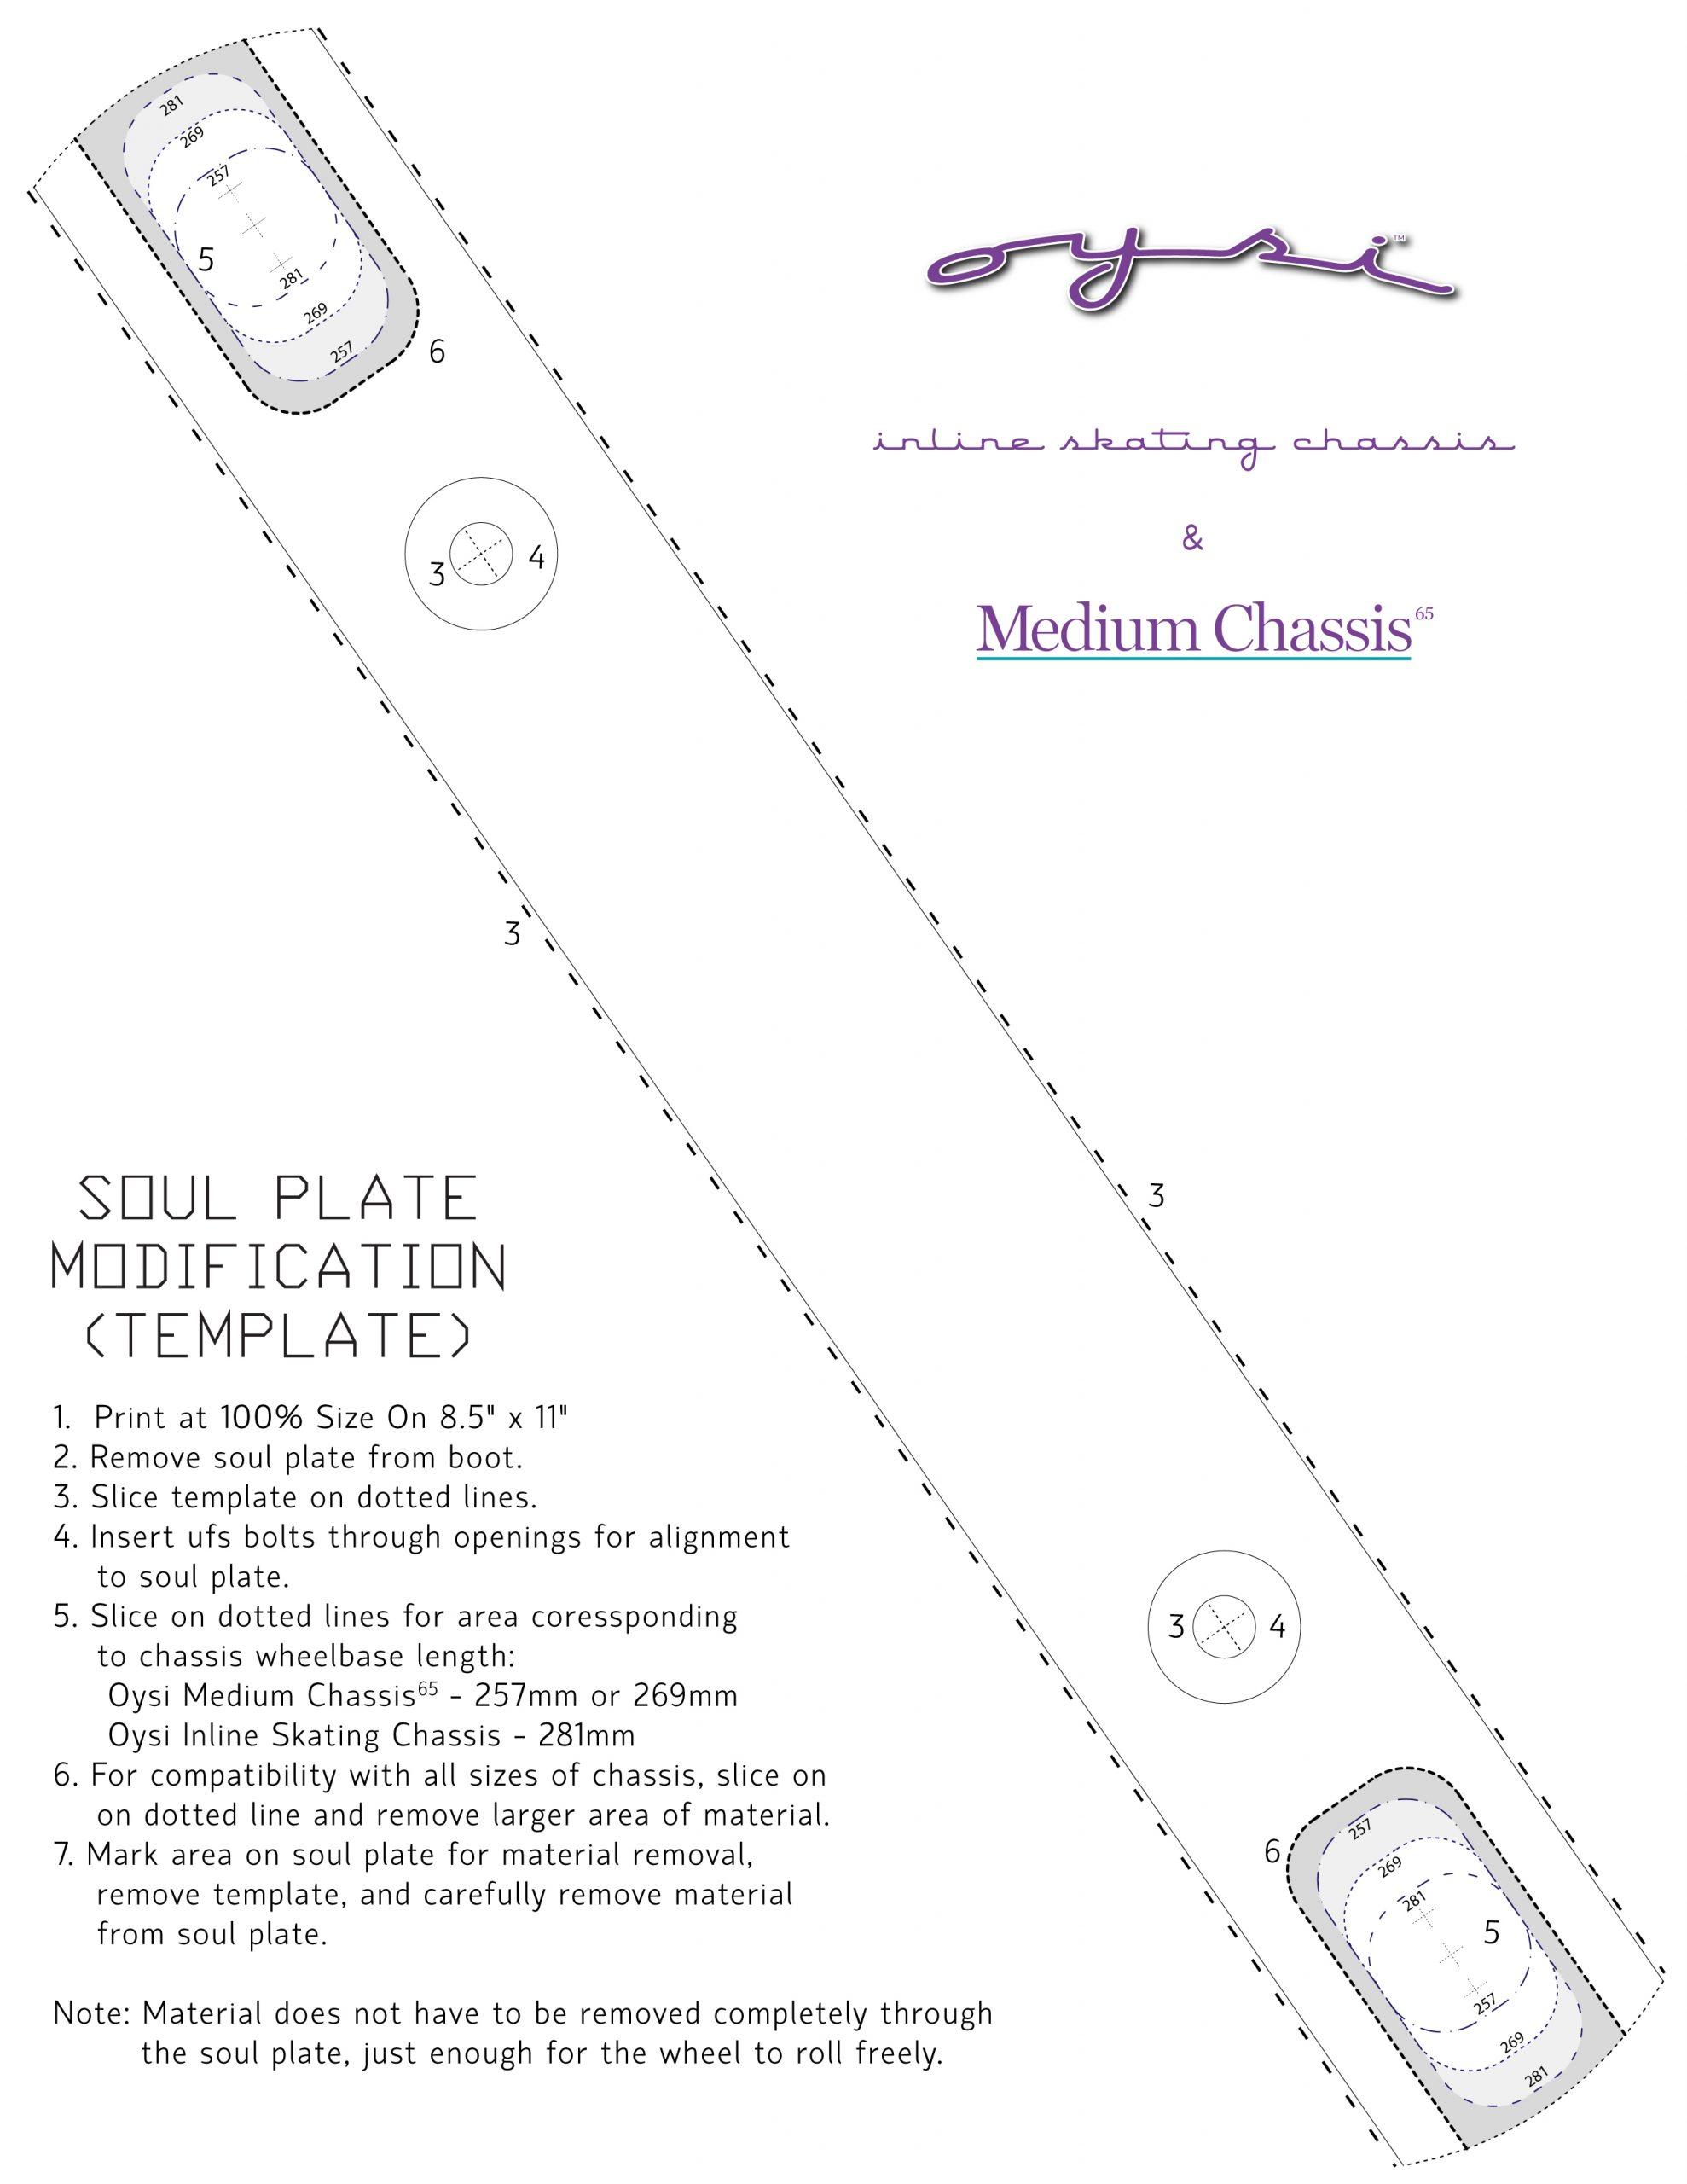 Soul Plate Modification Template_OISC & MC65